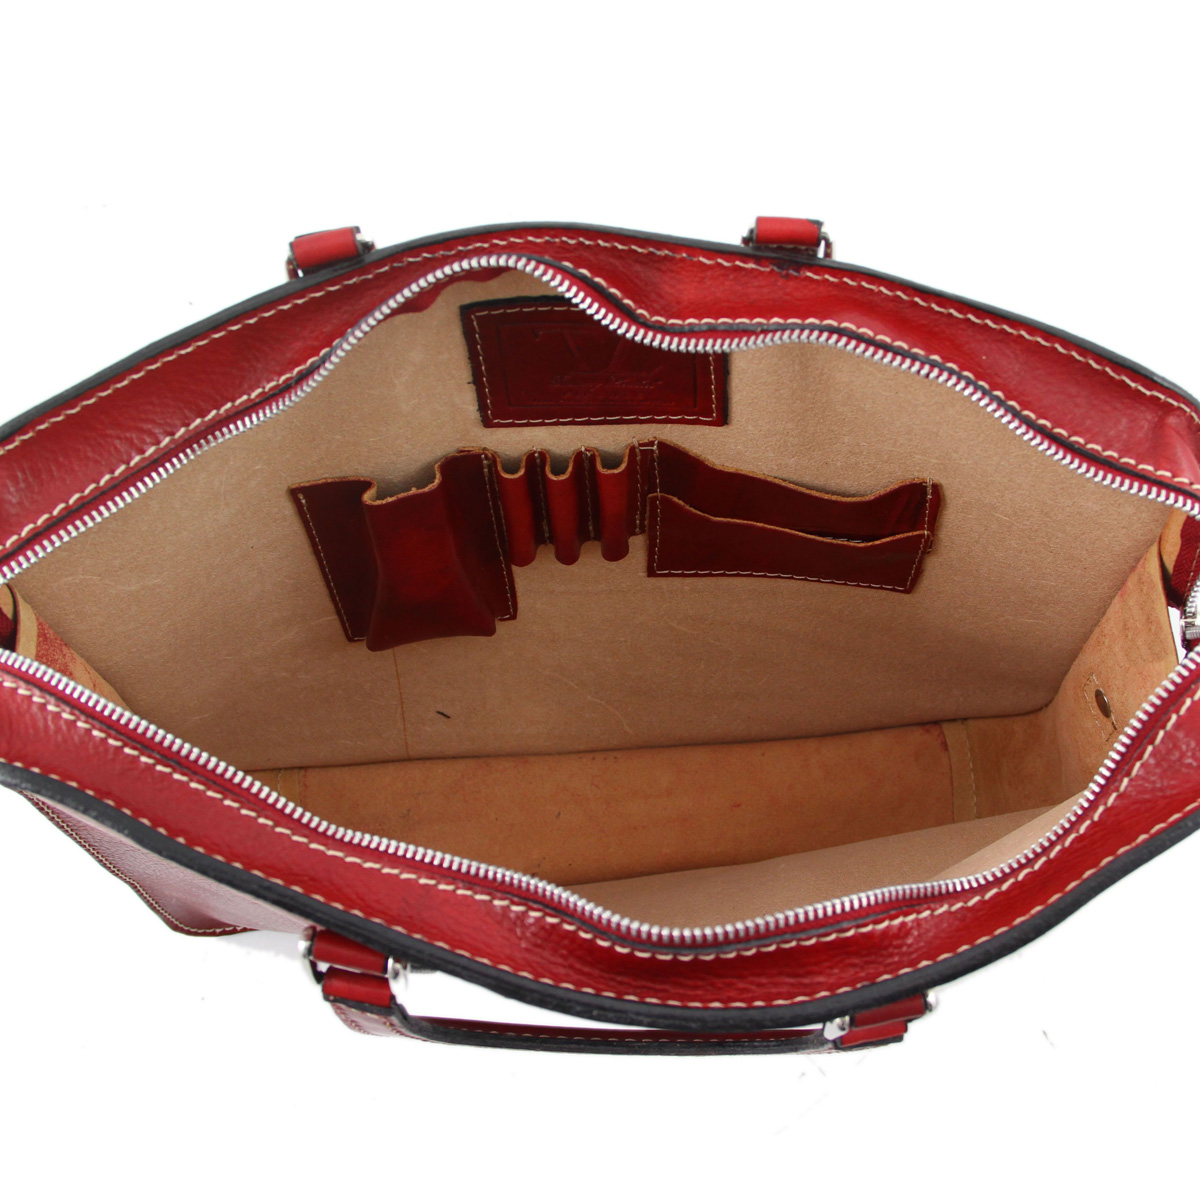 HemPORTFÖLJERDamportföljerTuscany LeatherPortfölj dam Alba Italienskt läder  TL140961. Previous 44a10f17355c4